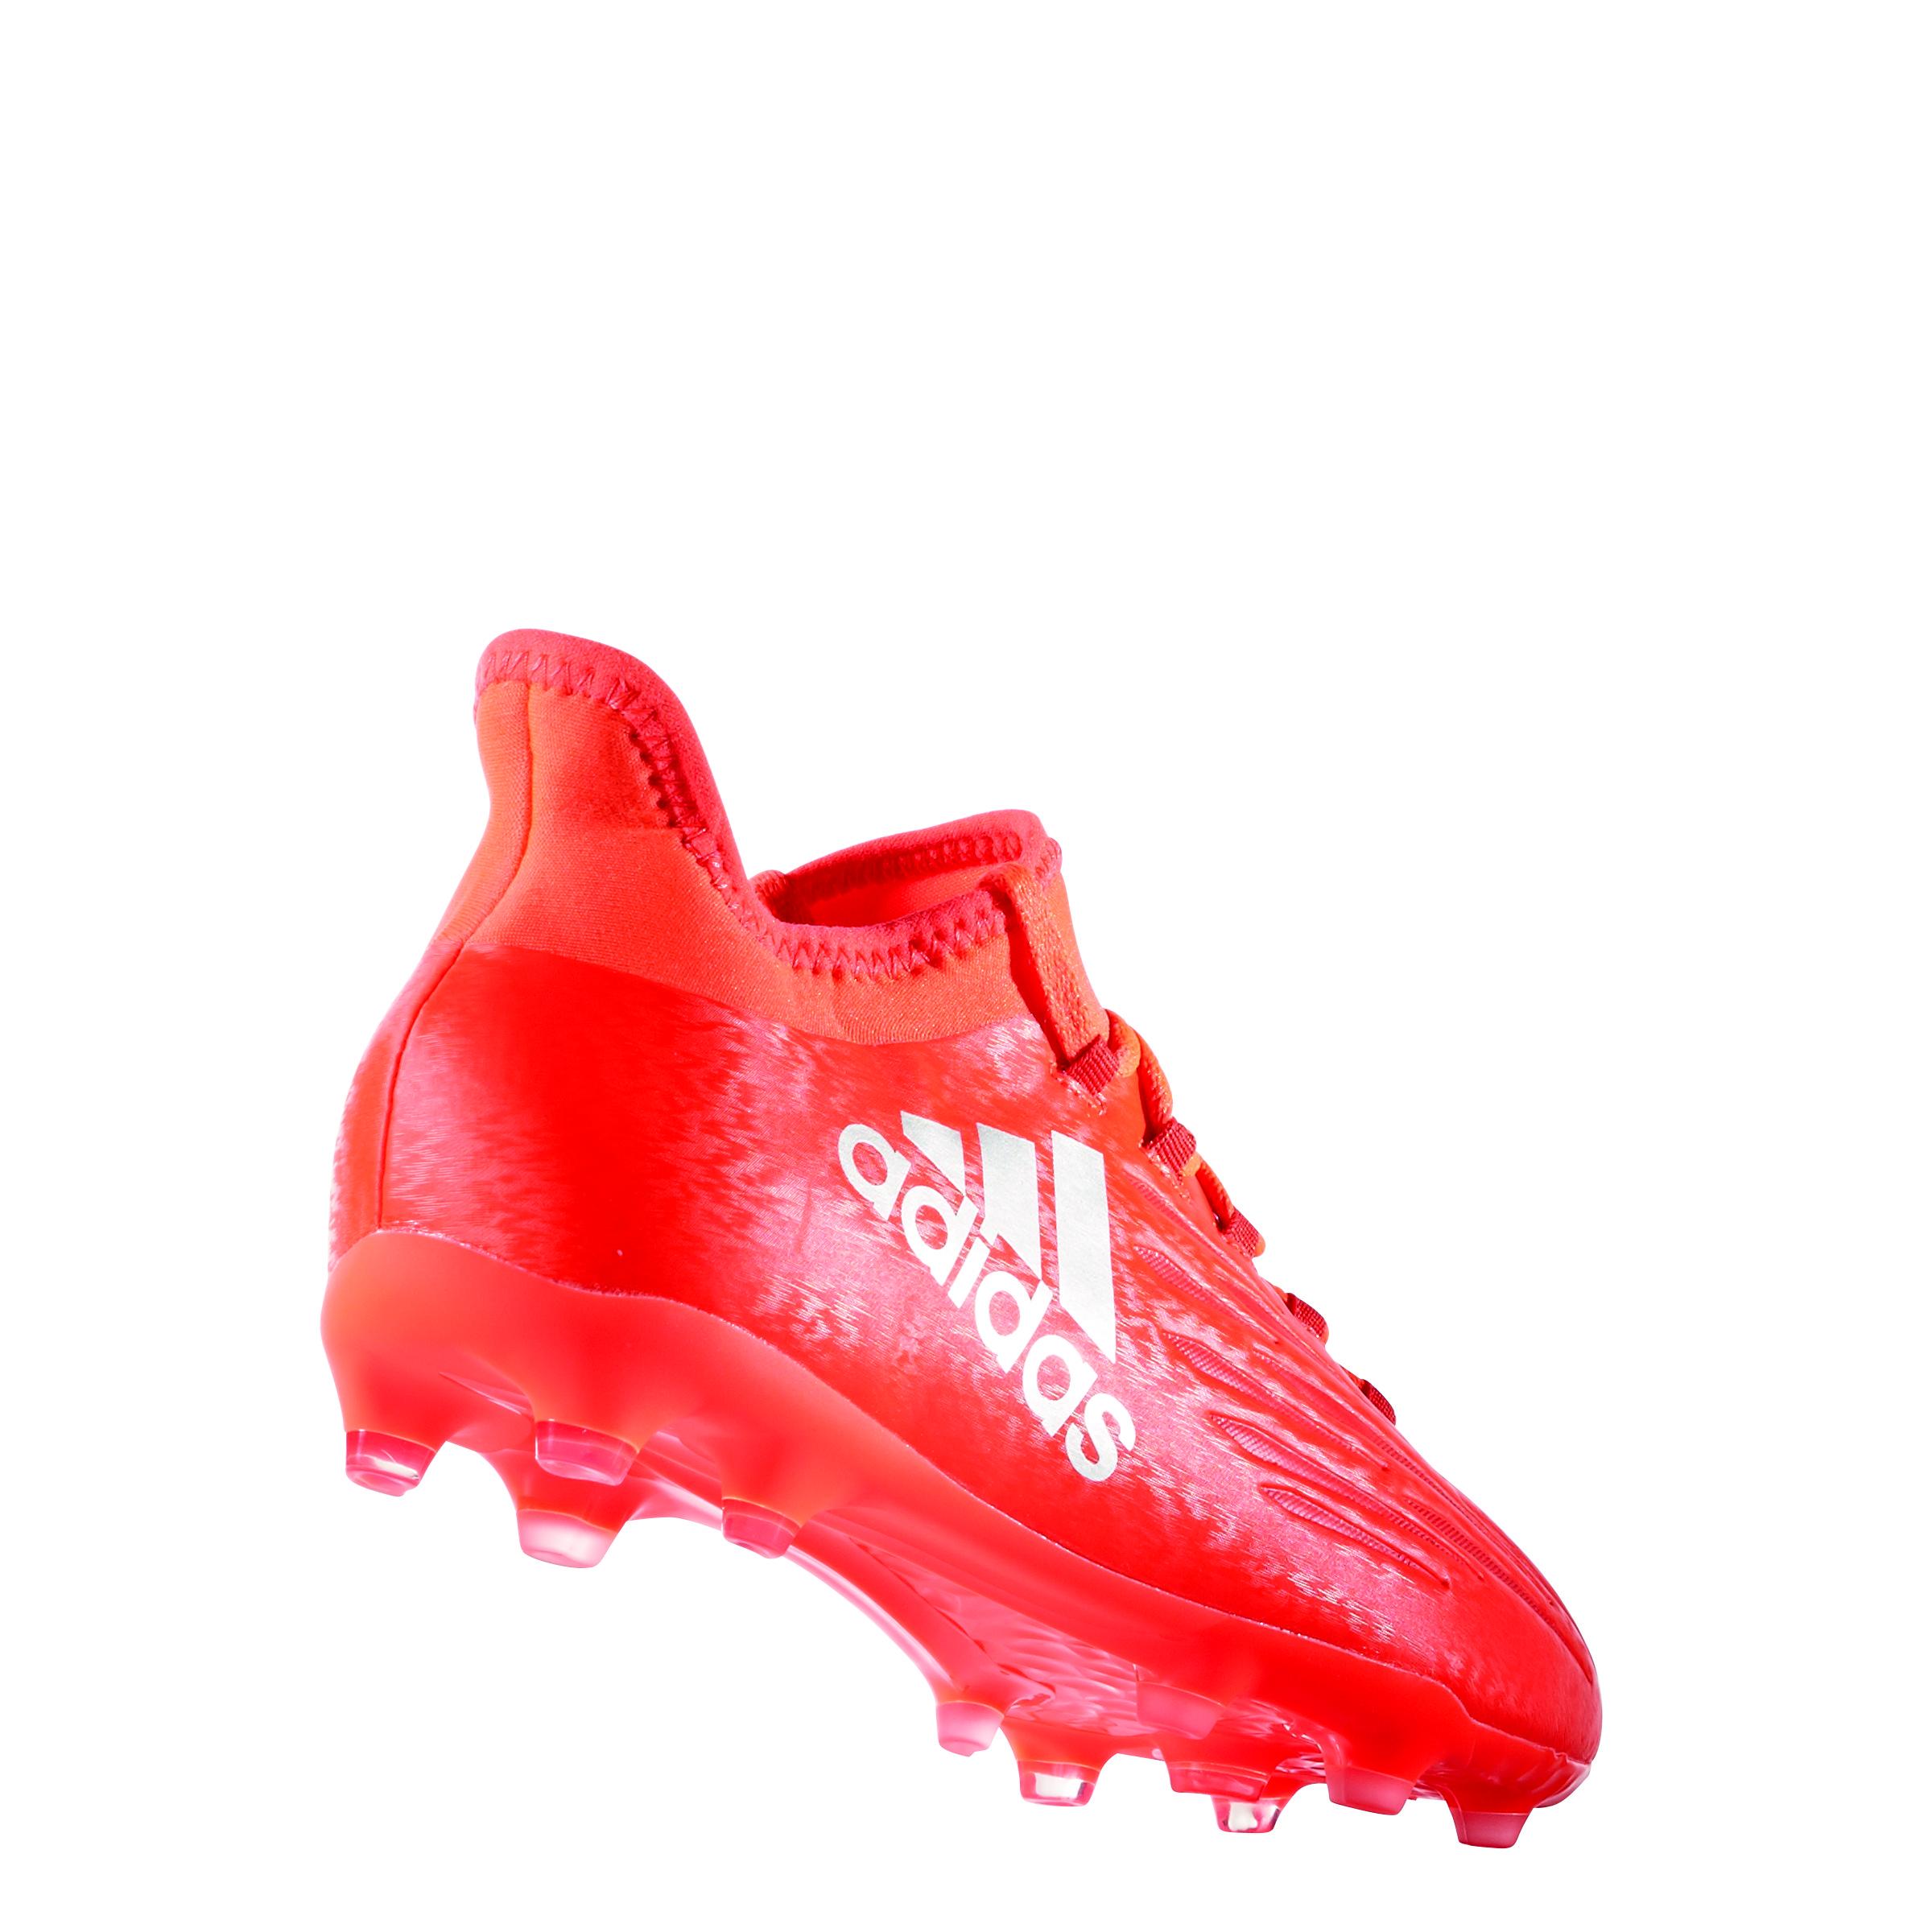 Nocken Kinder X Rot Fußball Schuhe J Adidas 1 Fußballschuhe 16 Fg 9EWHID2